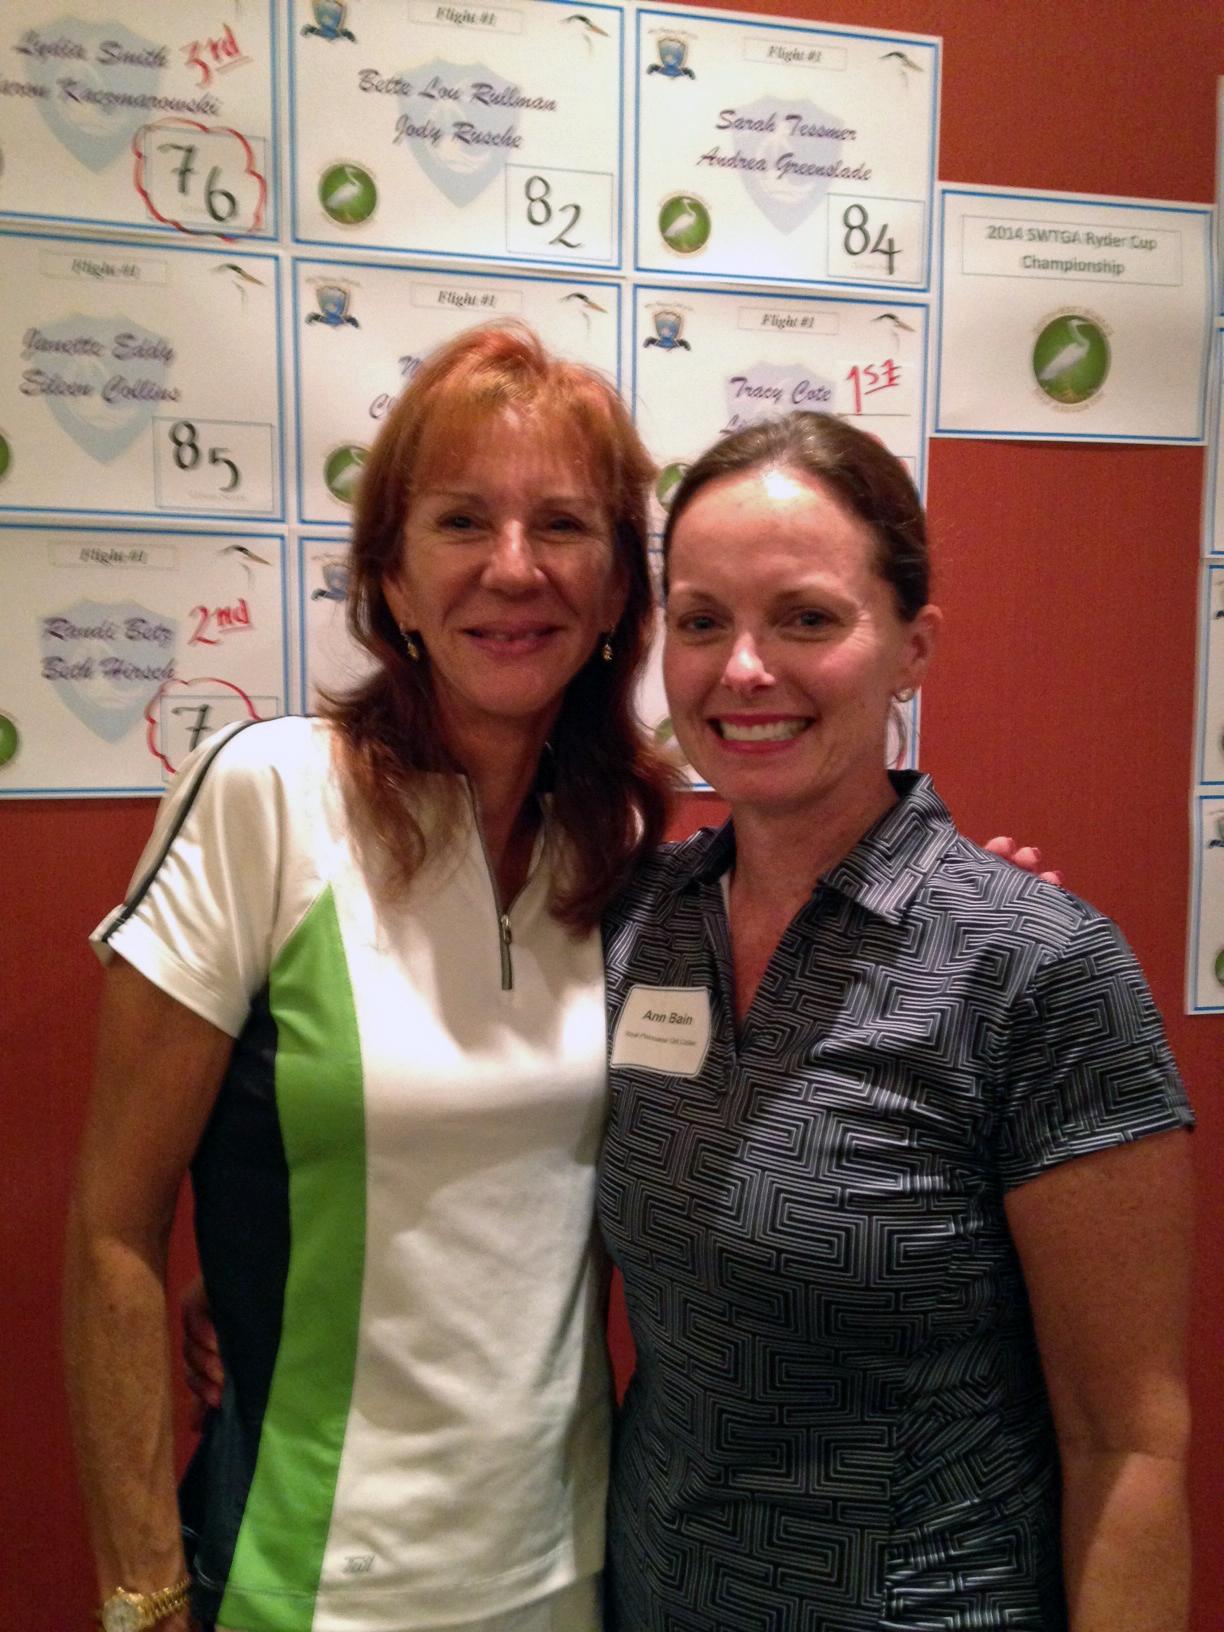 Cathy Wright and Ann Bain